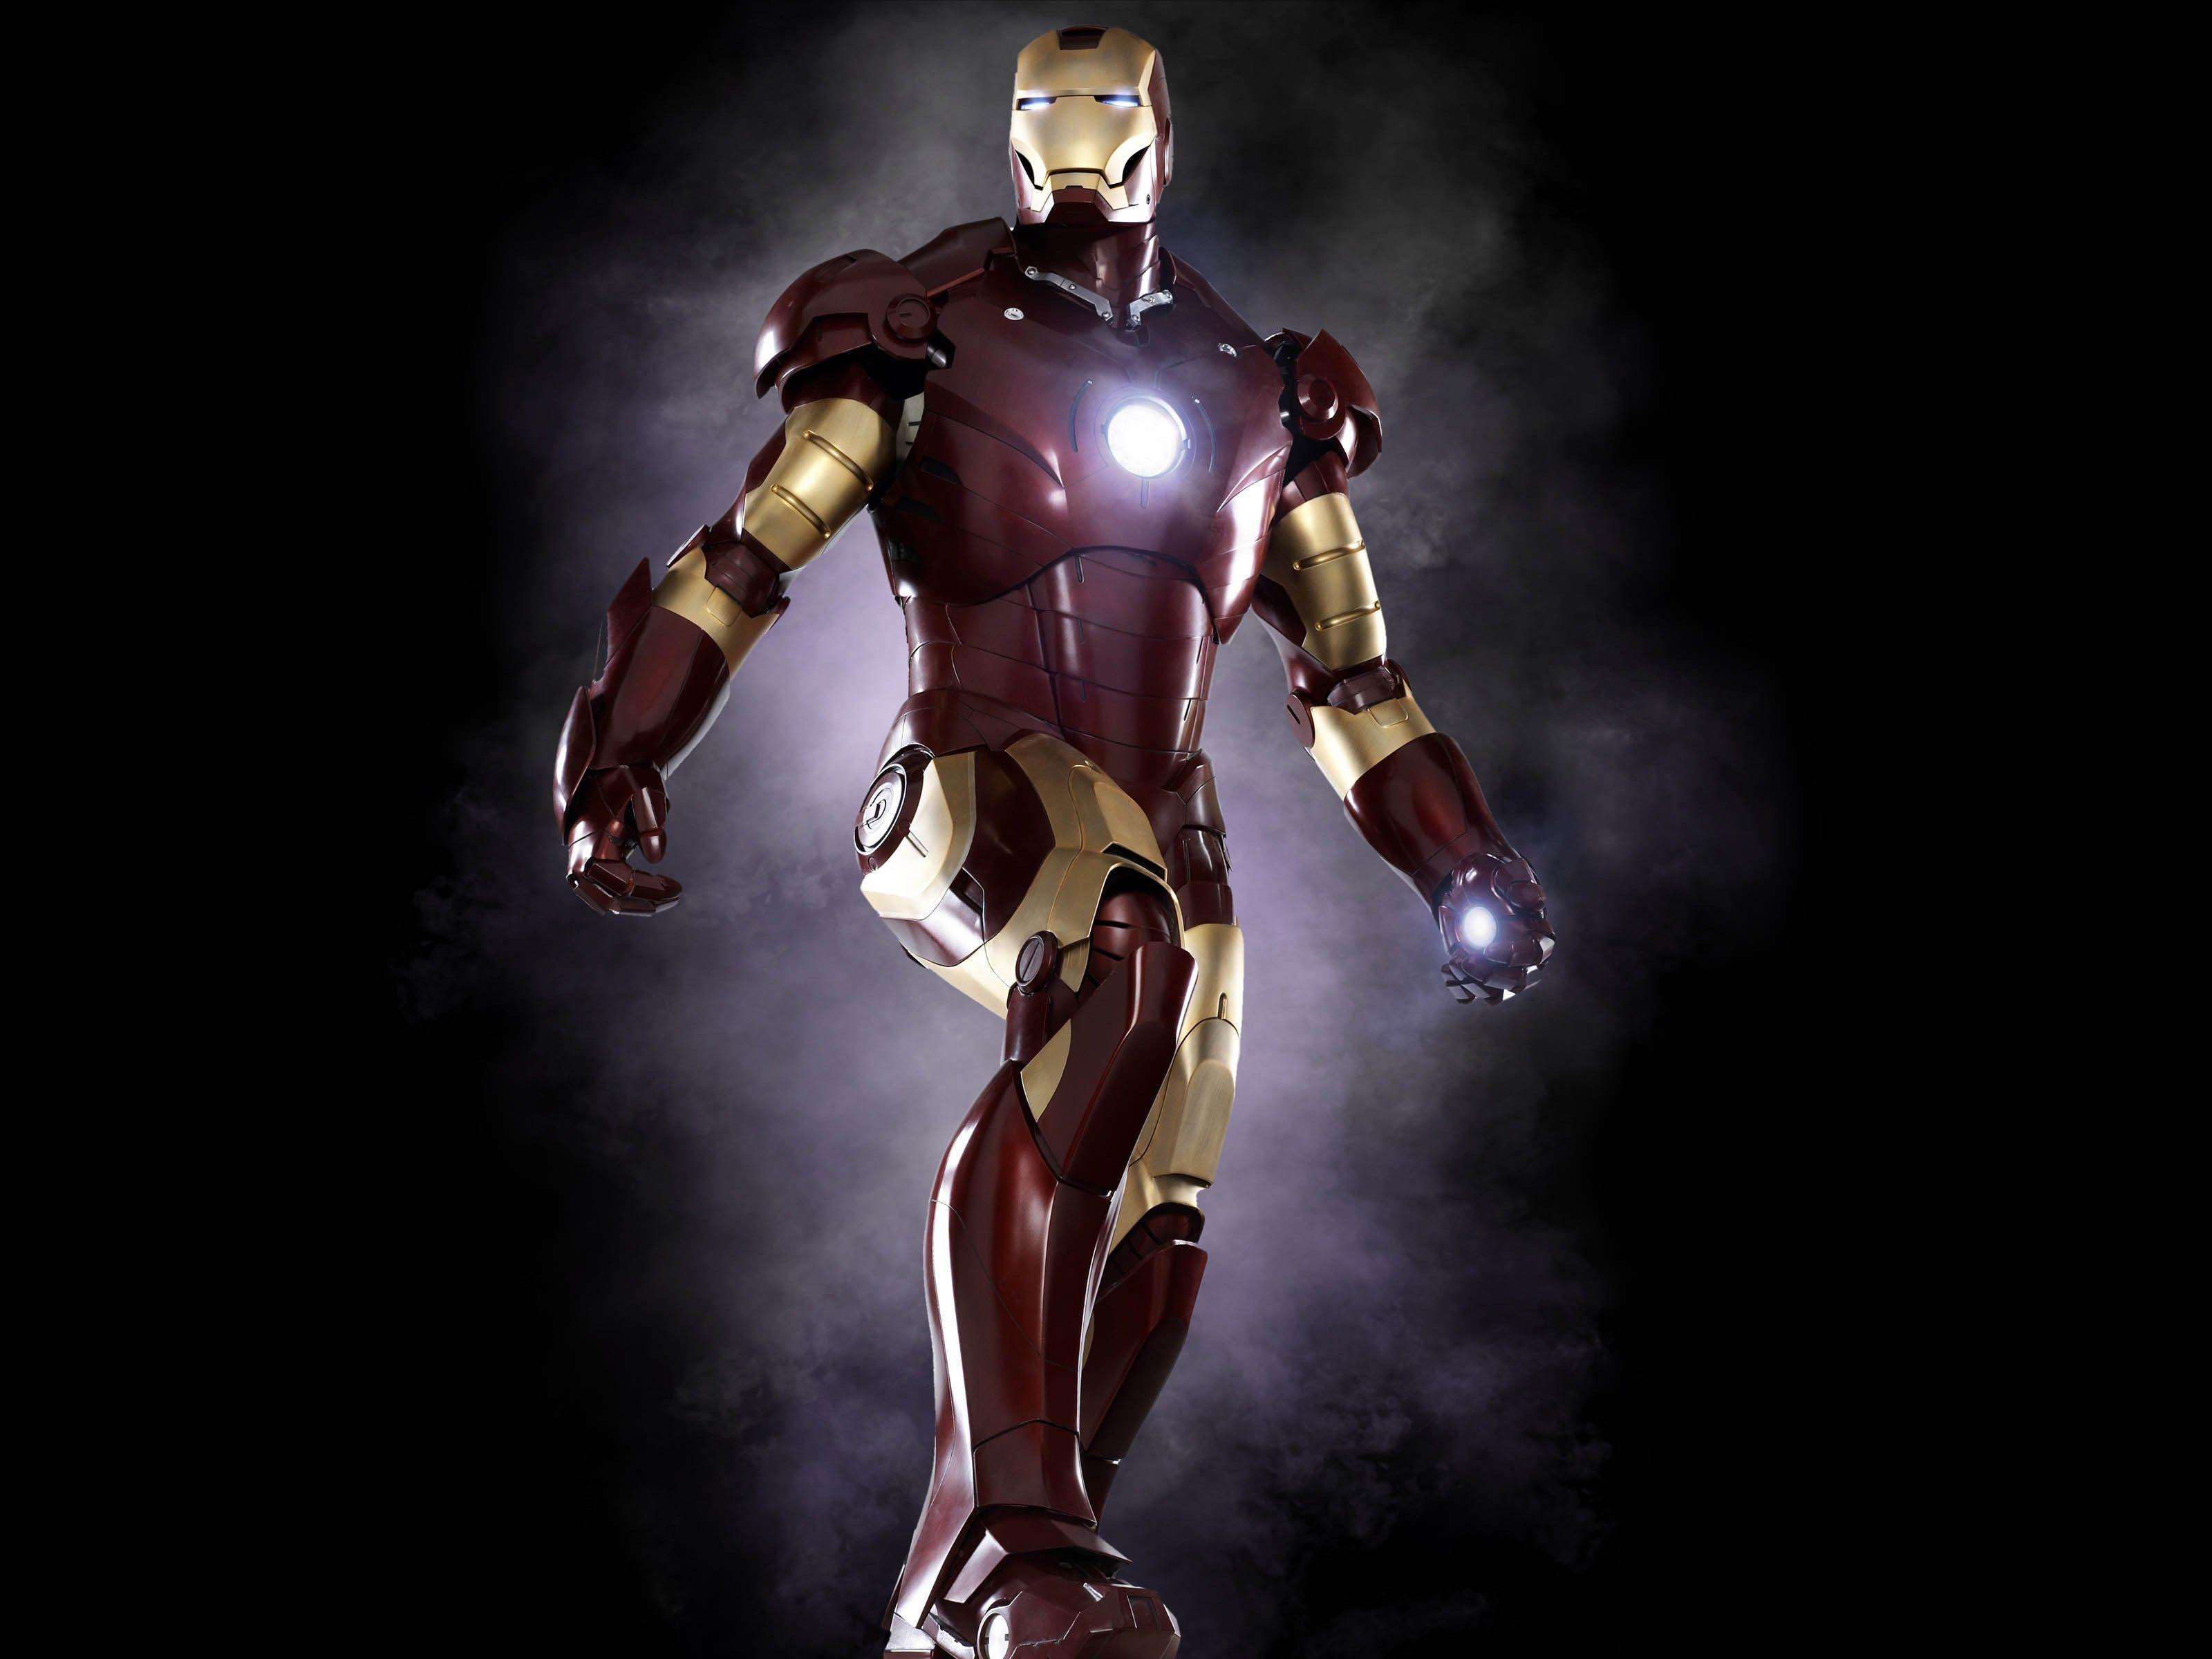 free desktop wallpaper downloads iron man 3 - iron man 3 category